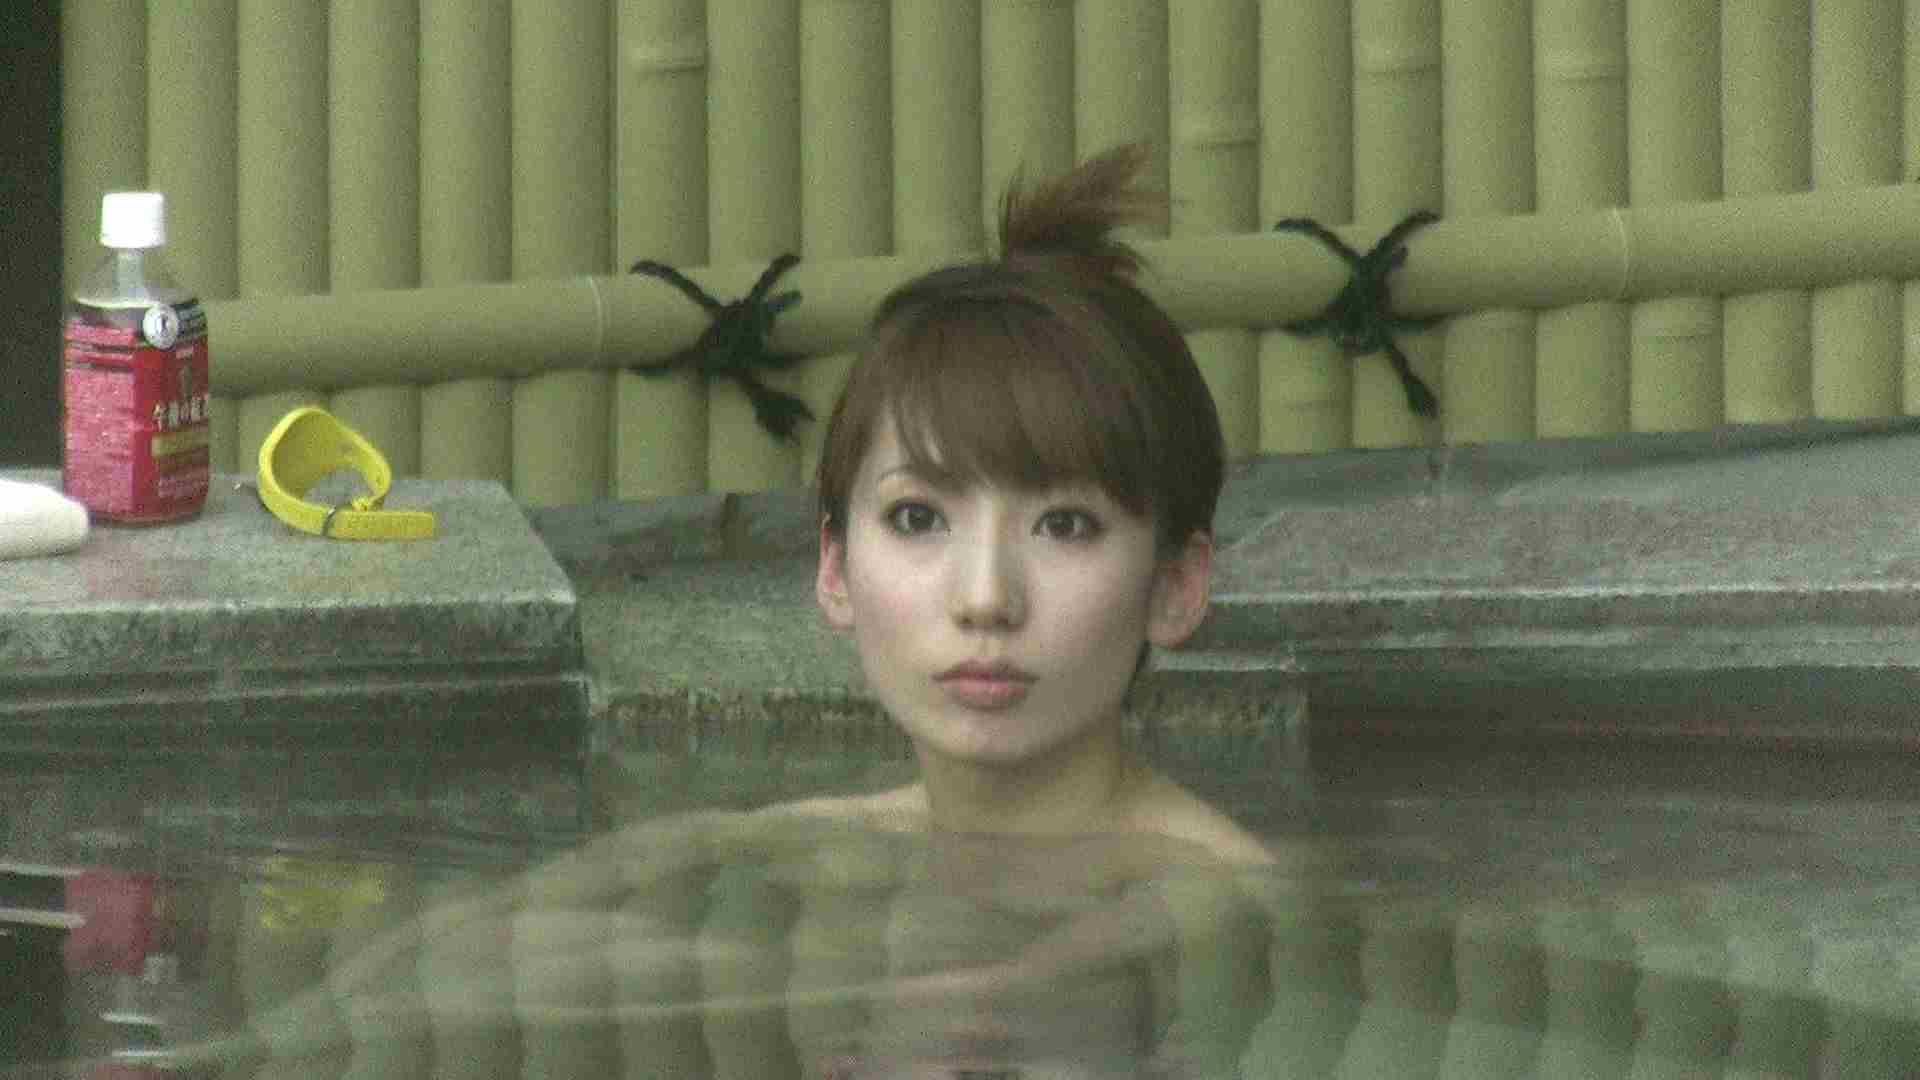 Aquaな露天風呂Vol.208 OLセックス   露天  85画像 31